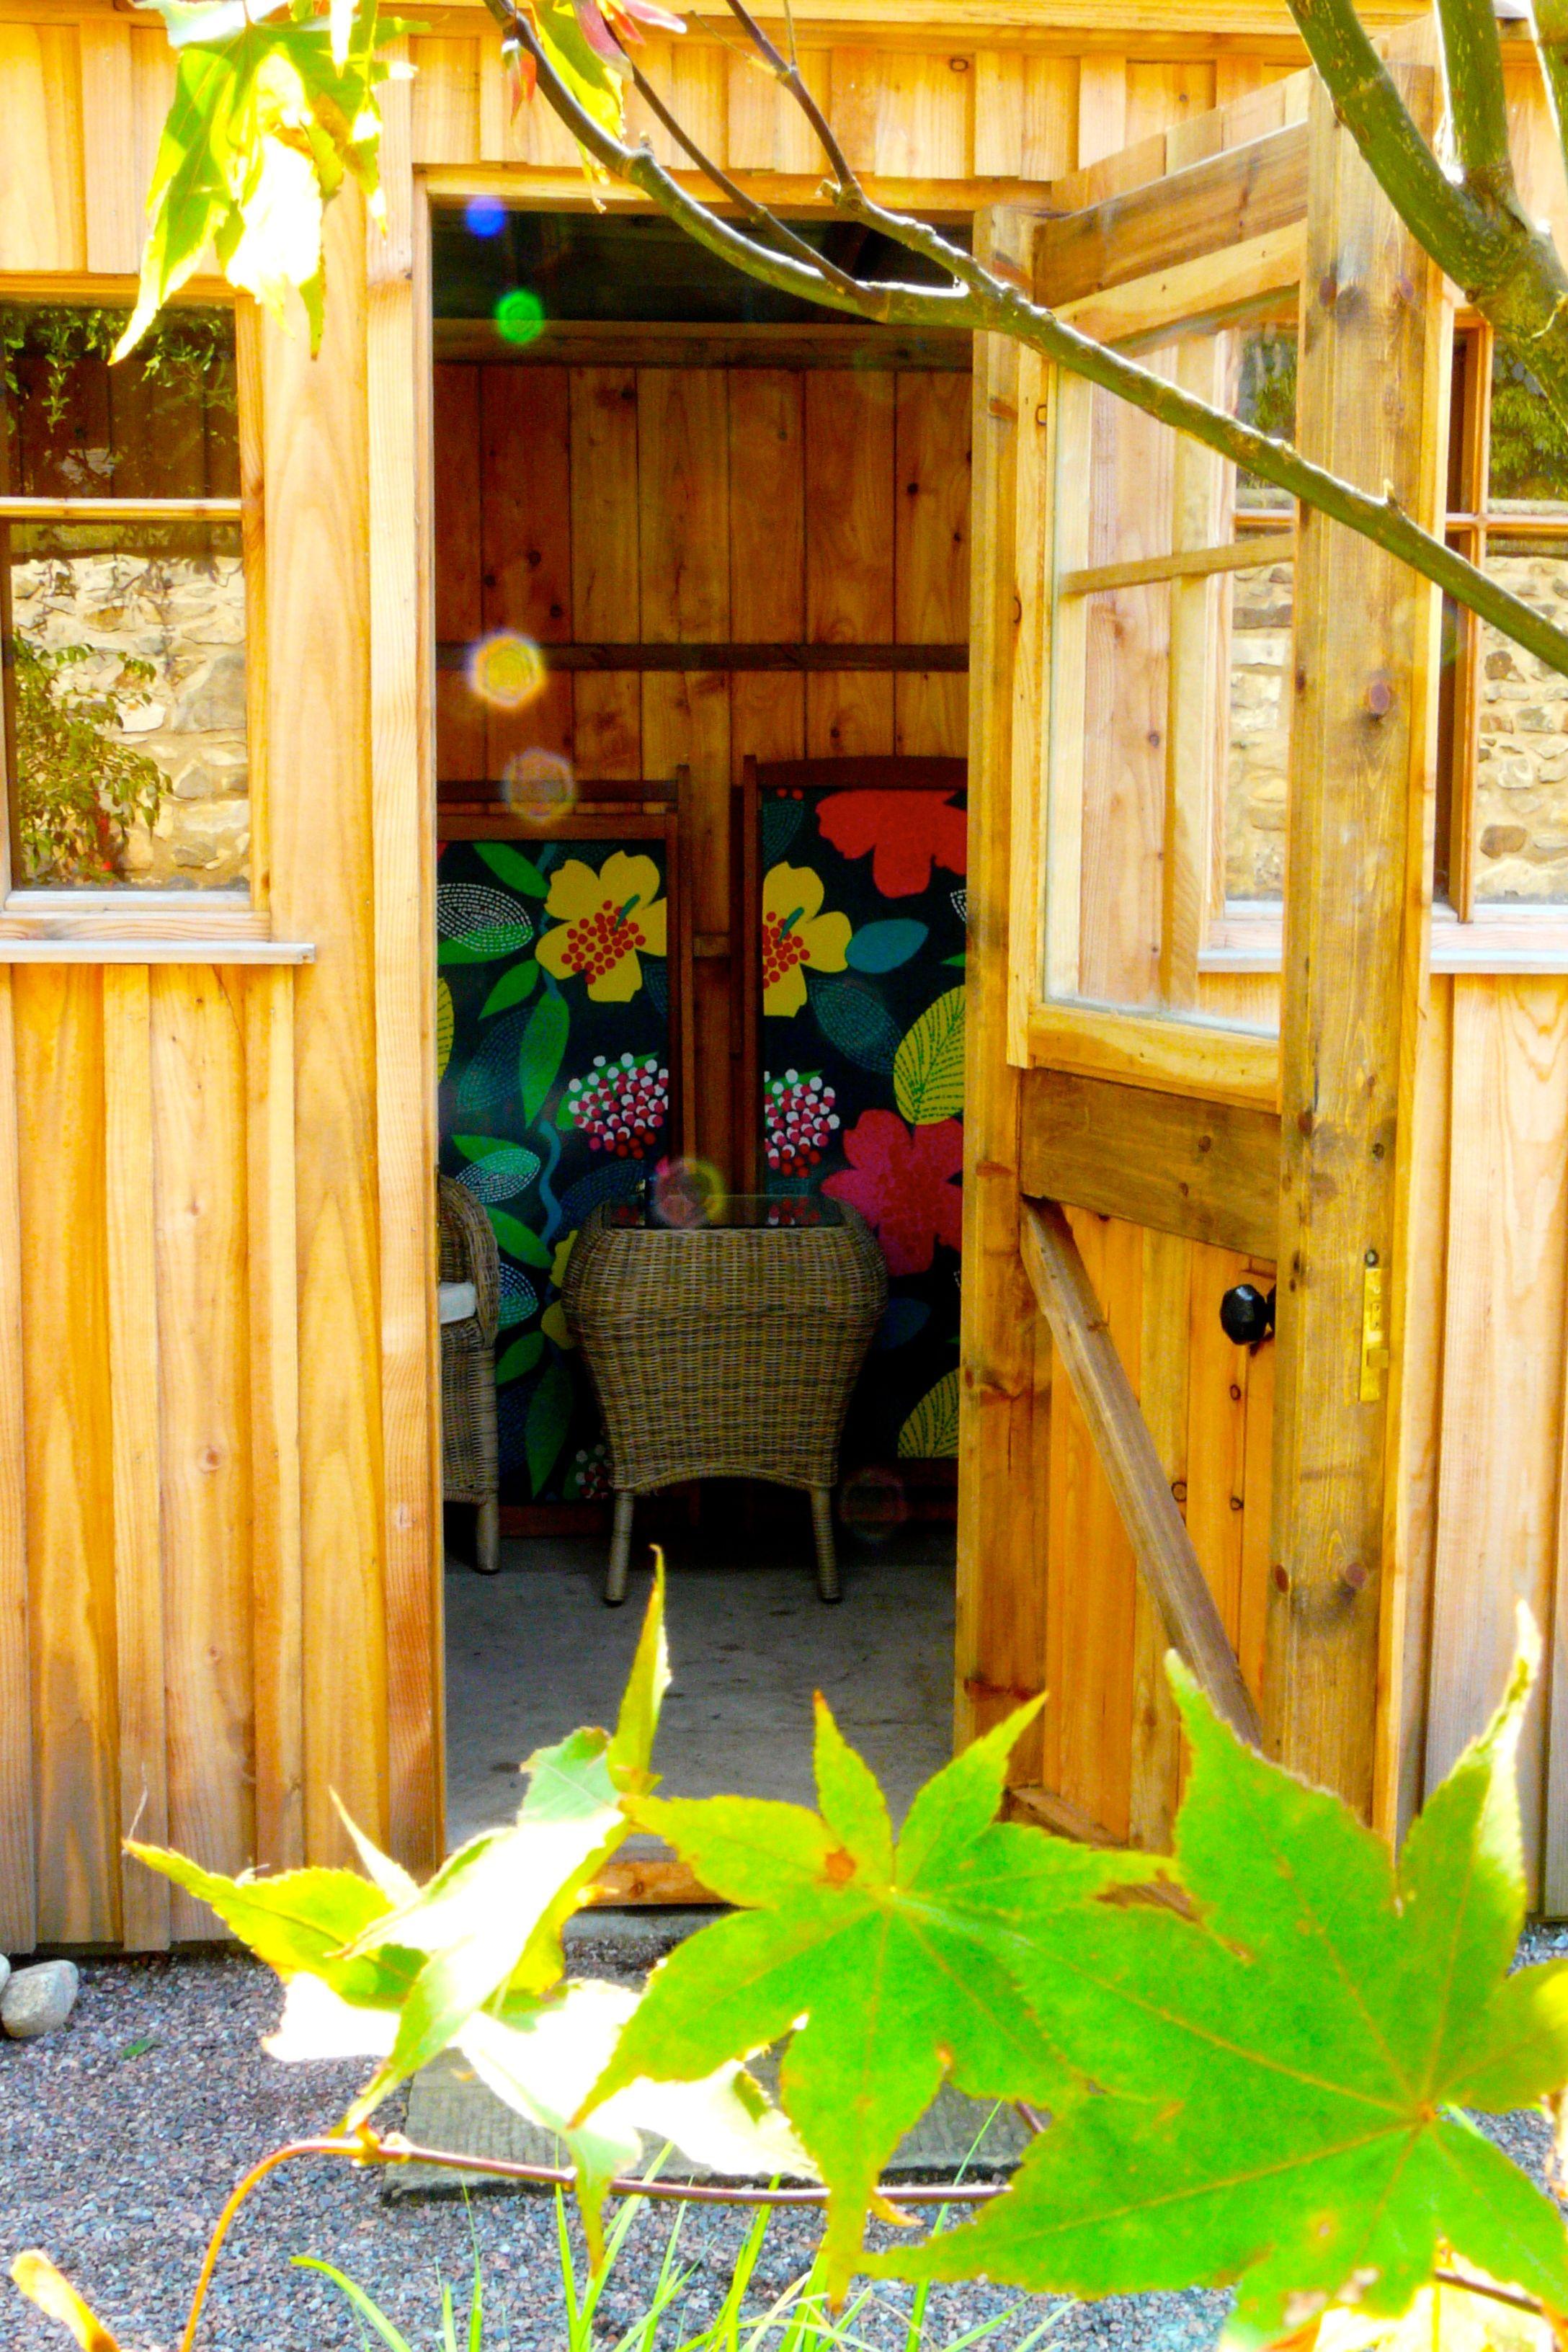 bespoke garden shed garden designed by carolyn grohmann wwwsecretgardensdesignco - Garden Sheds Edinburgh